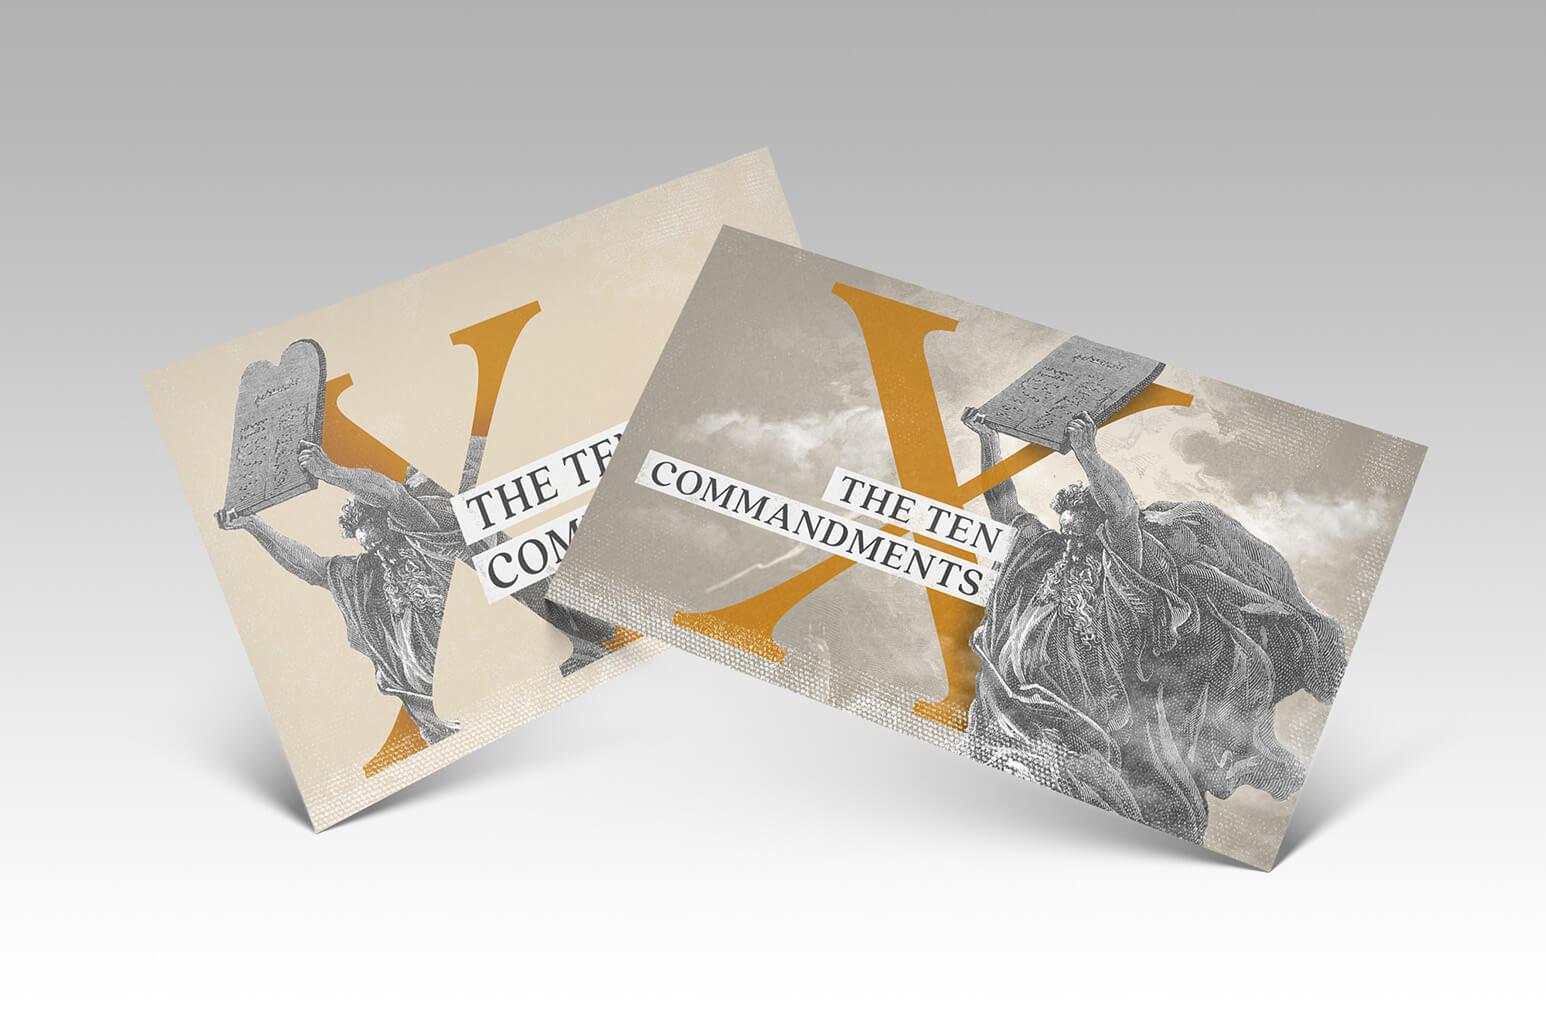 Custom print design by Stephen Houk Designs